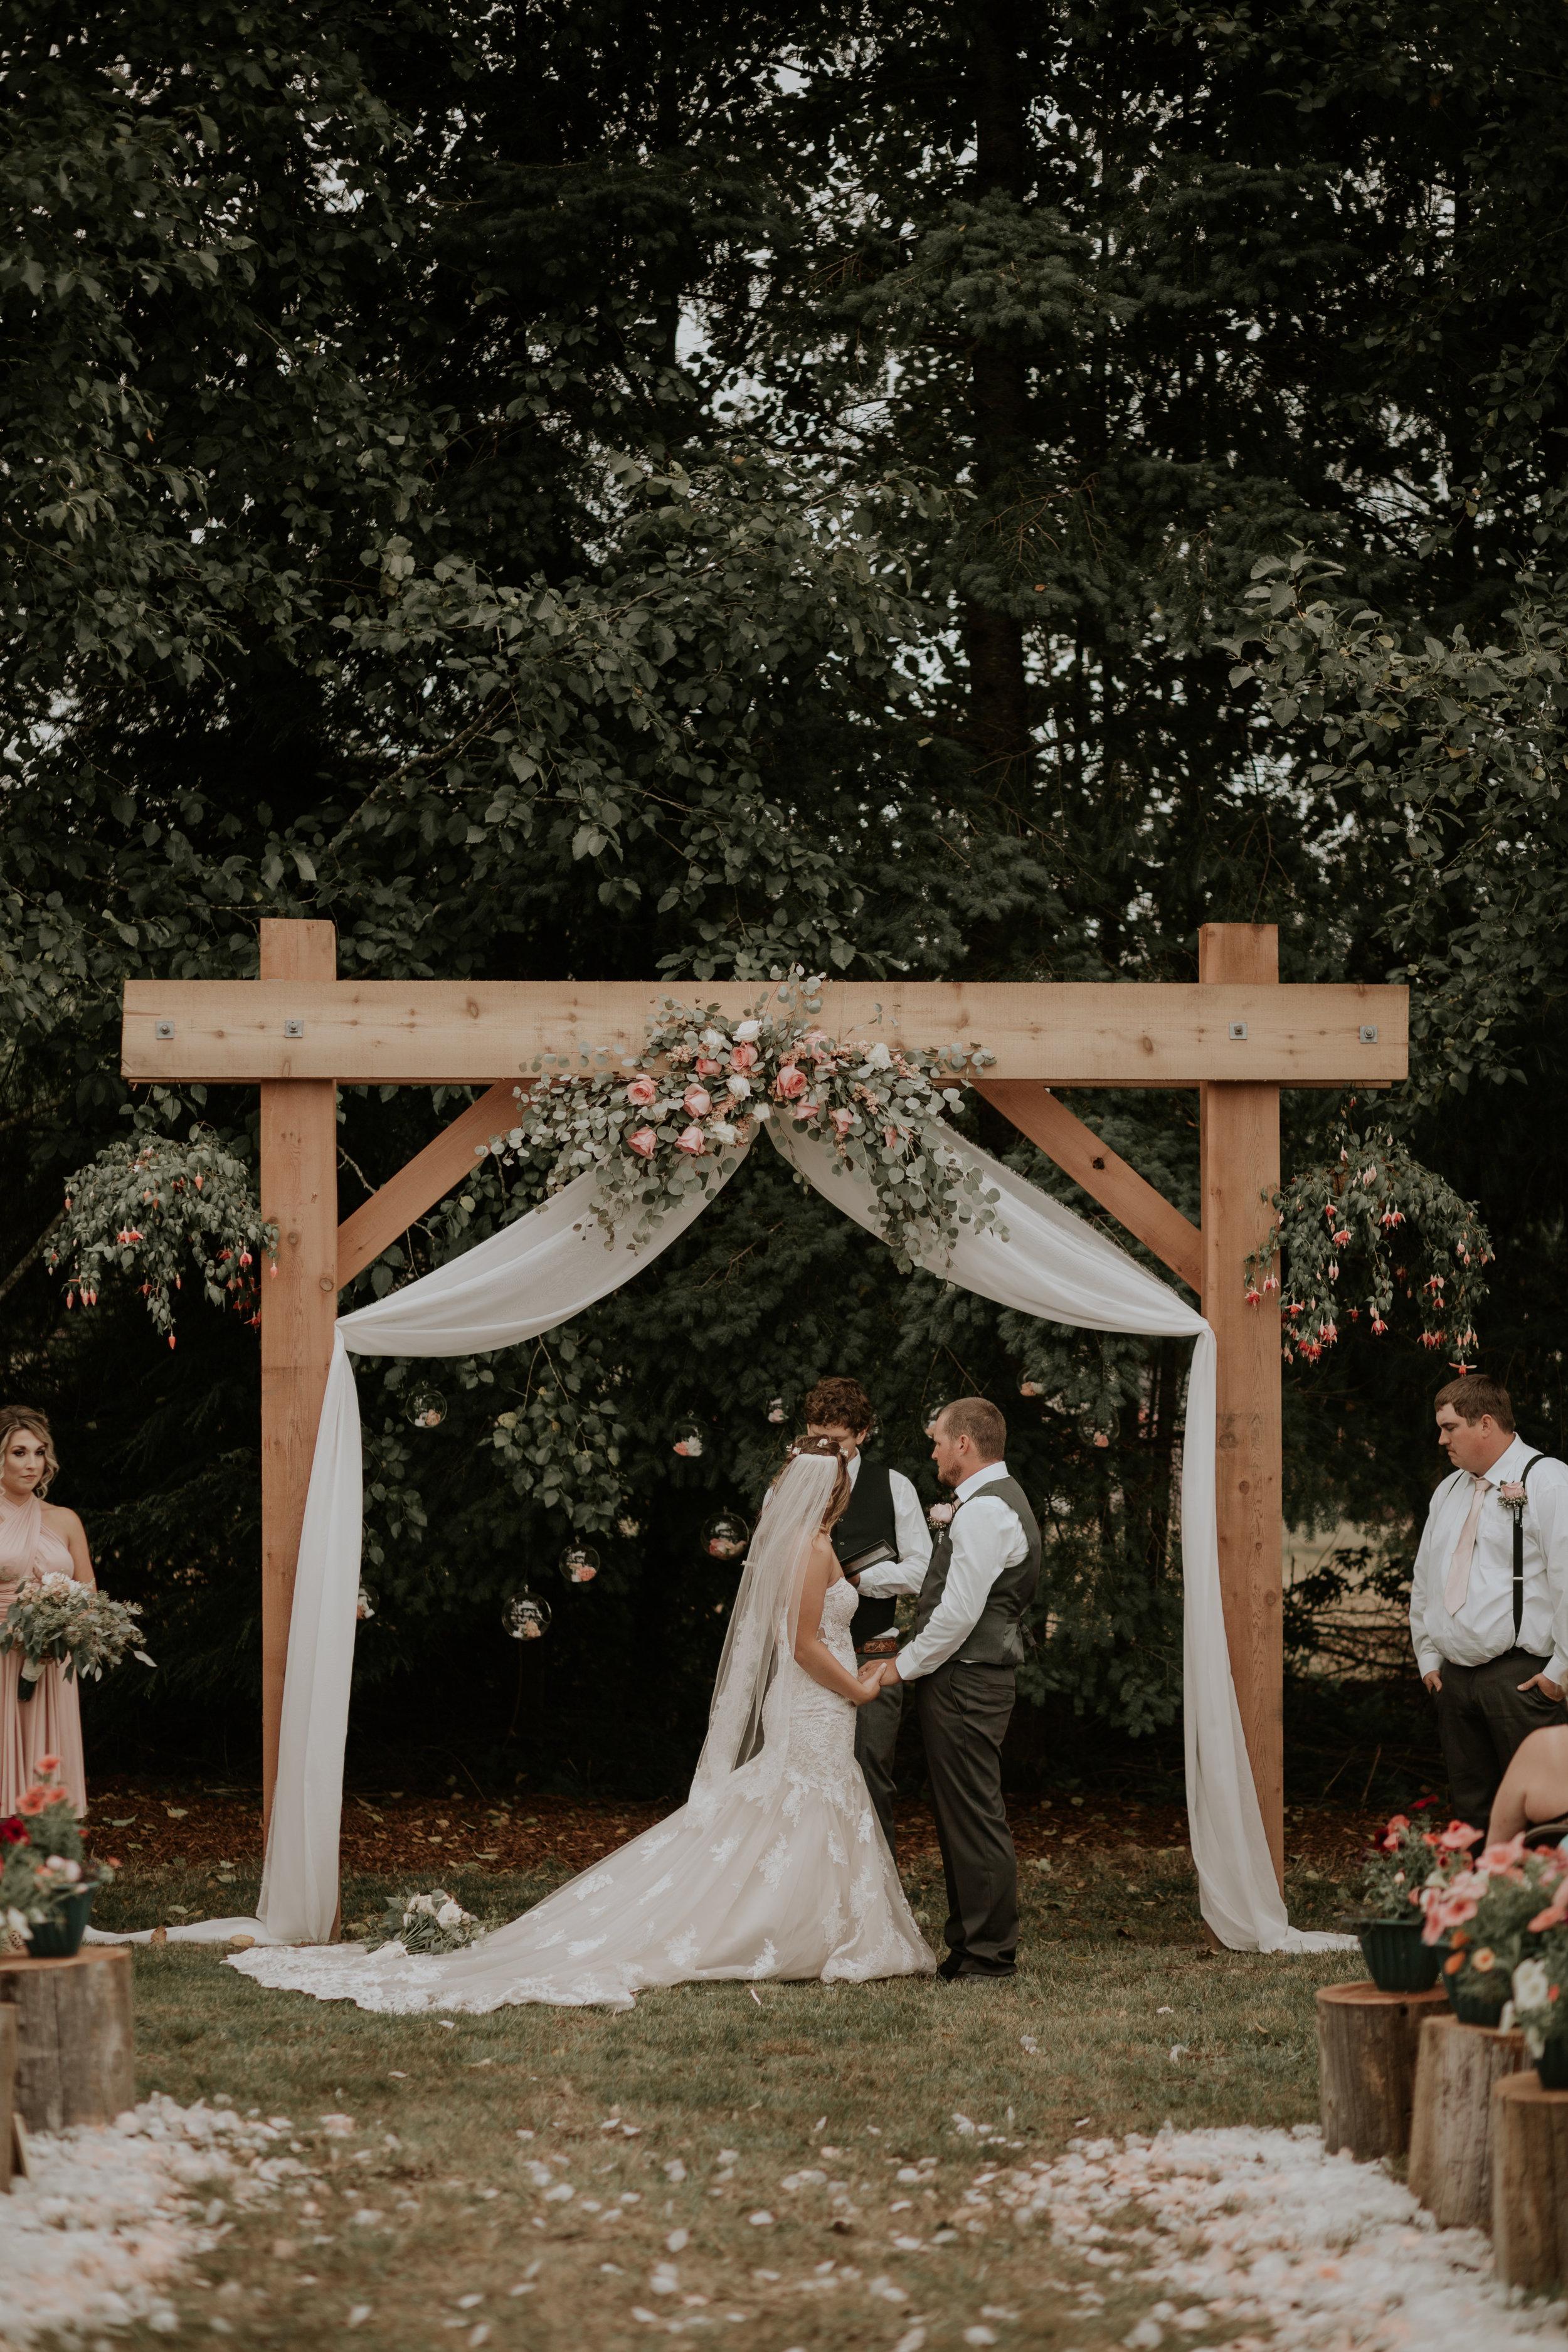 Olympic-Peninsula-Wedding-Photographer-PNW-Forks-Port-Angeles-Kayla-Dawn-Photography-engagement-Olympic-National-Park-44.jpg